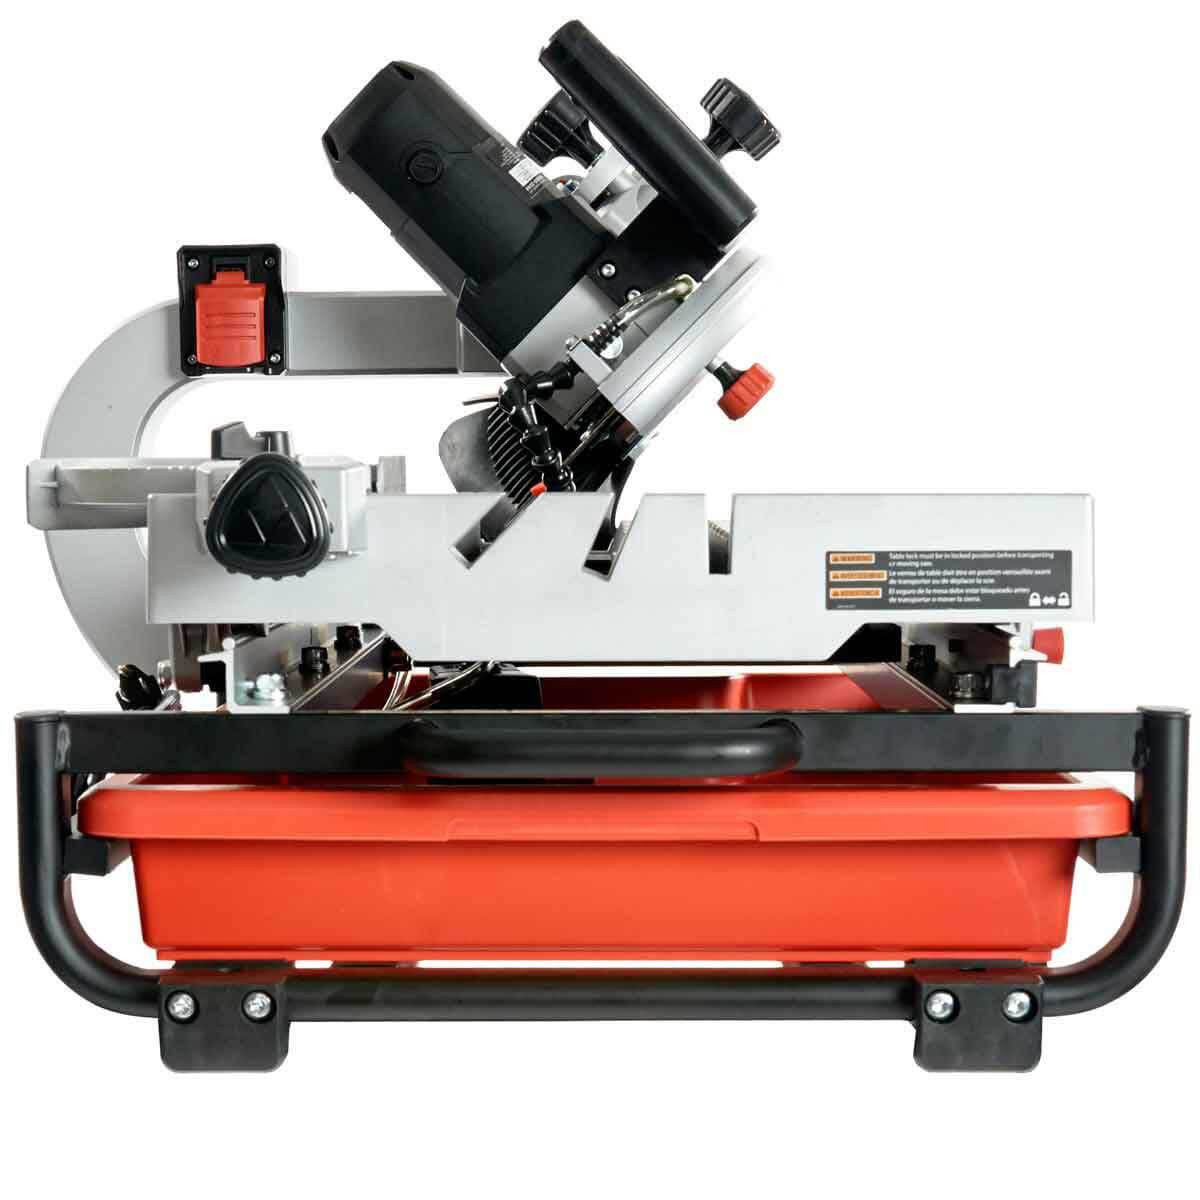 Lackmond Beast7 45 degree cutting capability